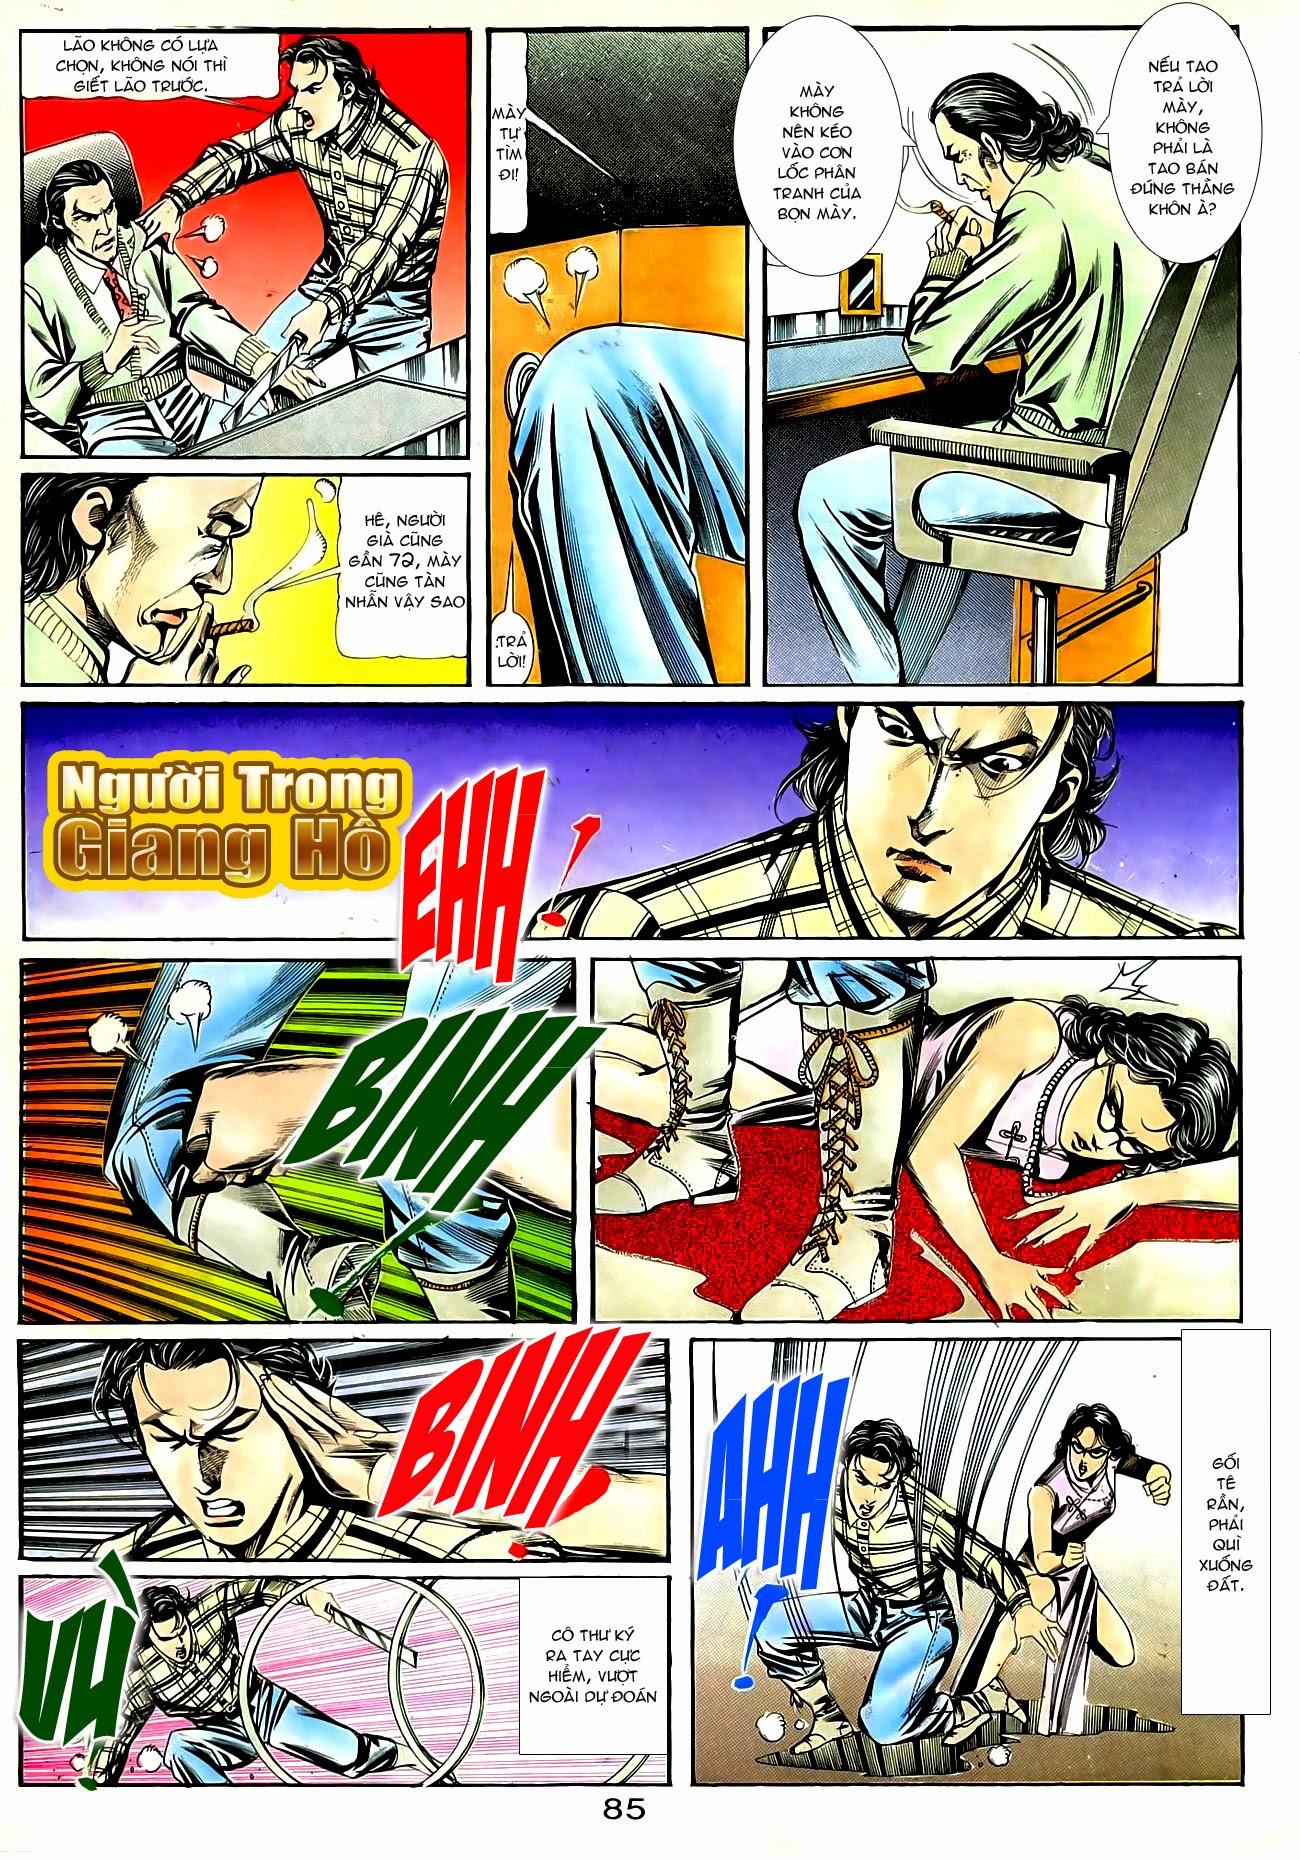 Người Trong Giang Hồ chapter 90: giang hồ hiểm trang 21